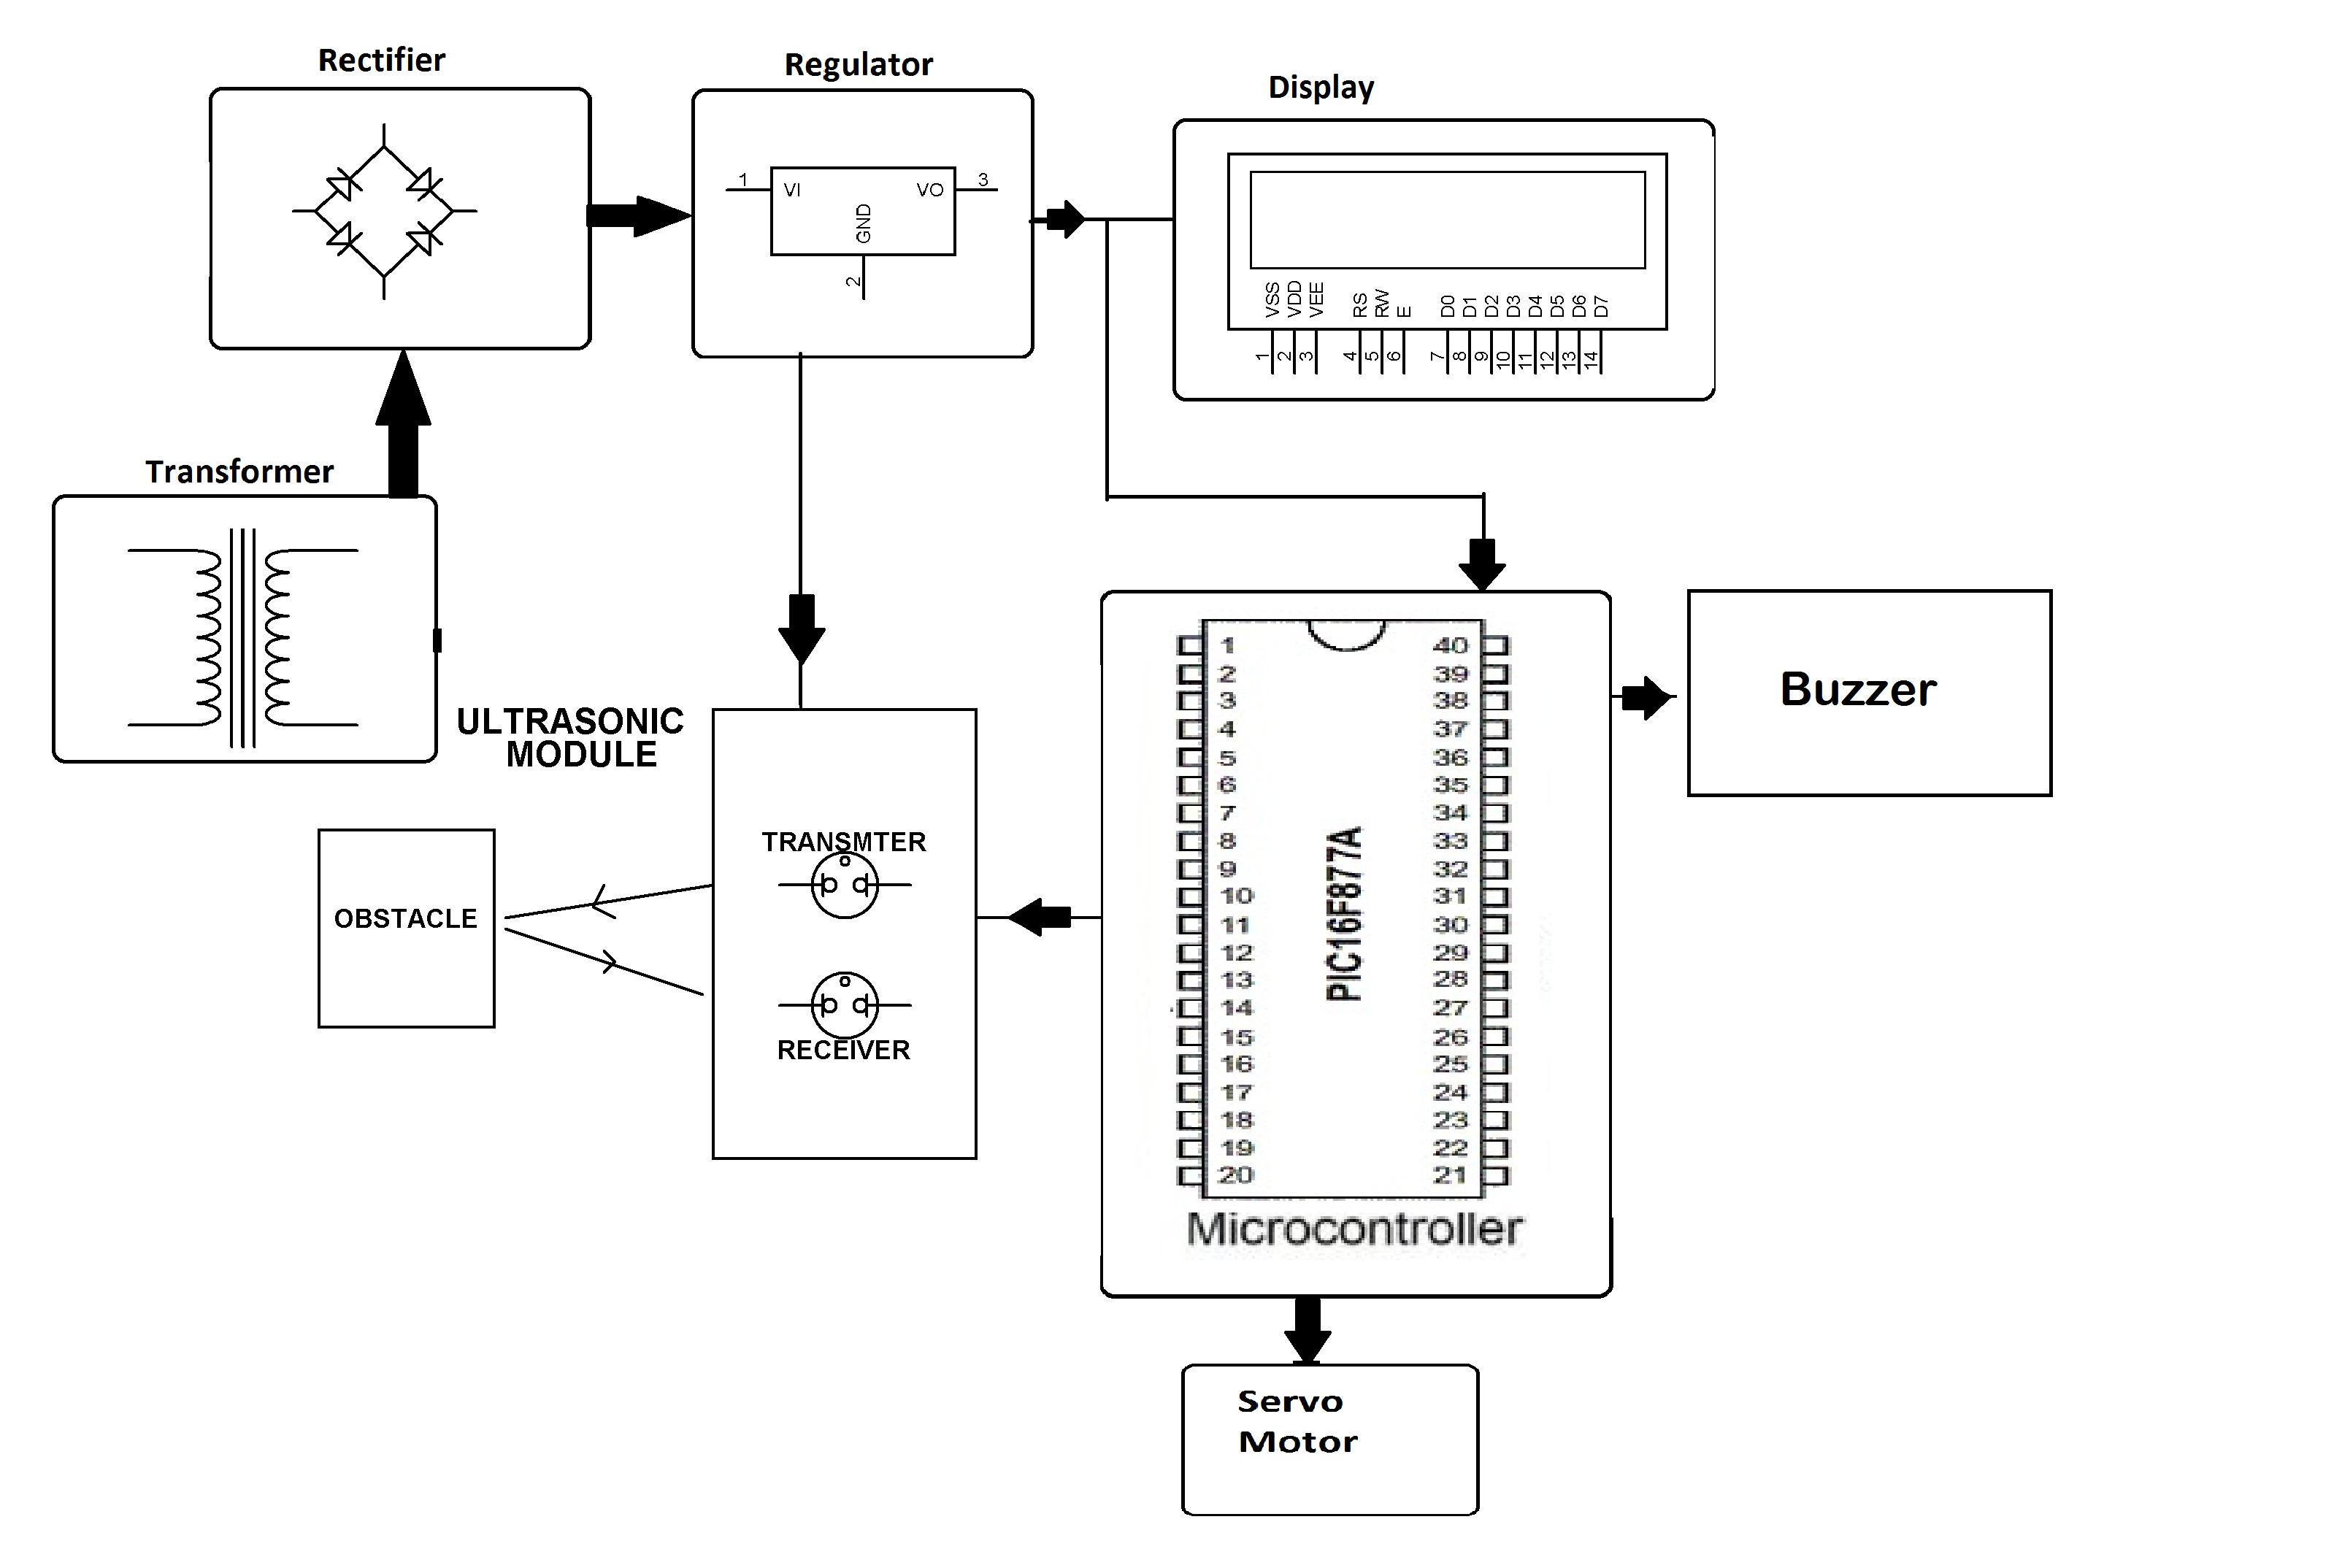 PIC Based Ultrasonic Radar Project on